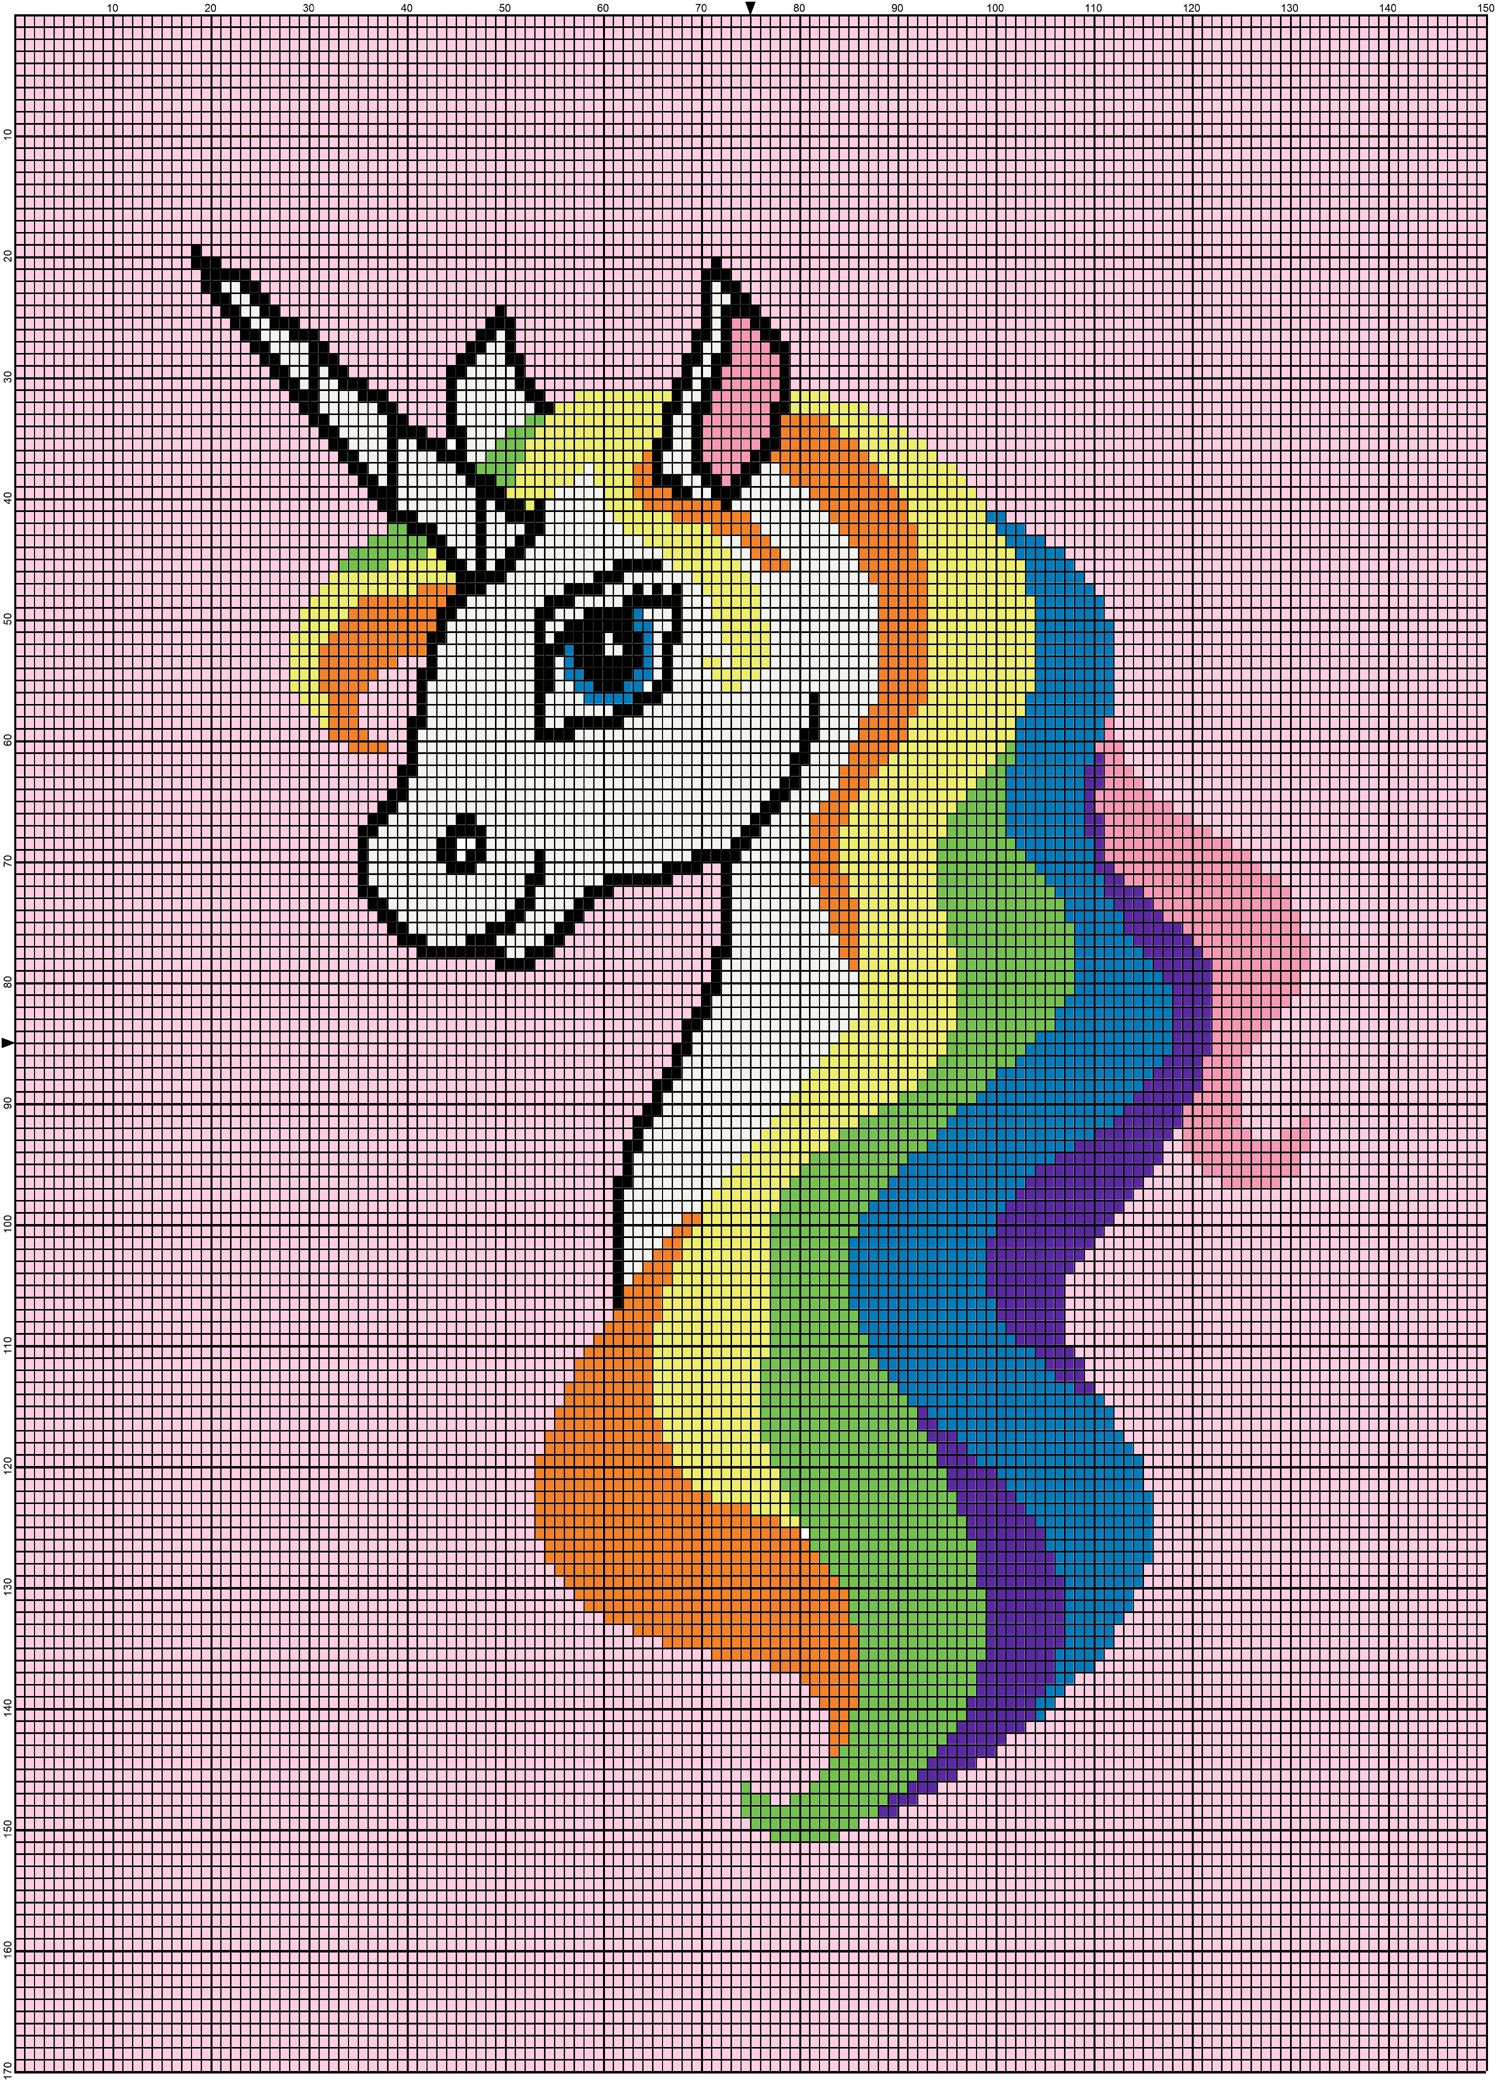 Unicorn c2c | Crochet unicorn blanket, Crochet unicorn ...